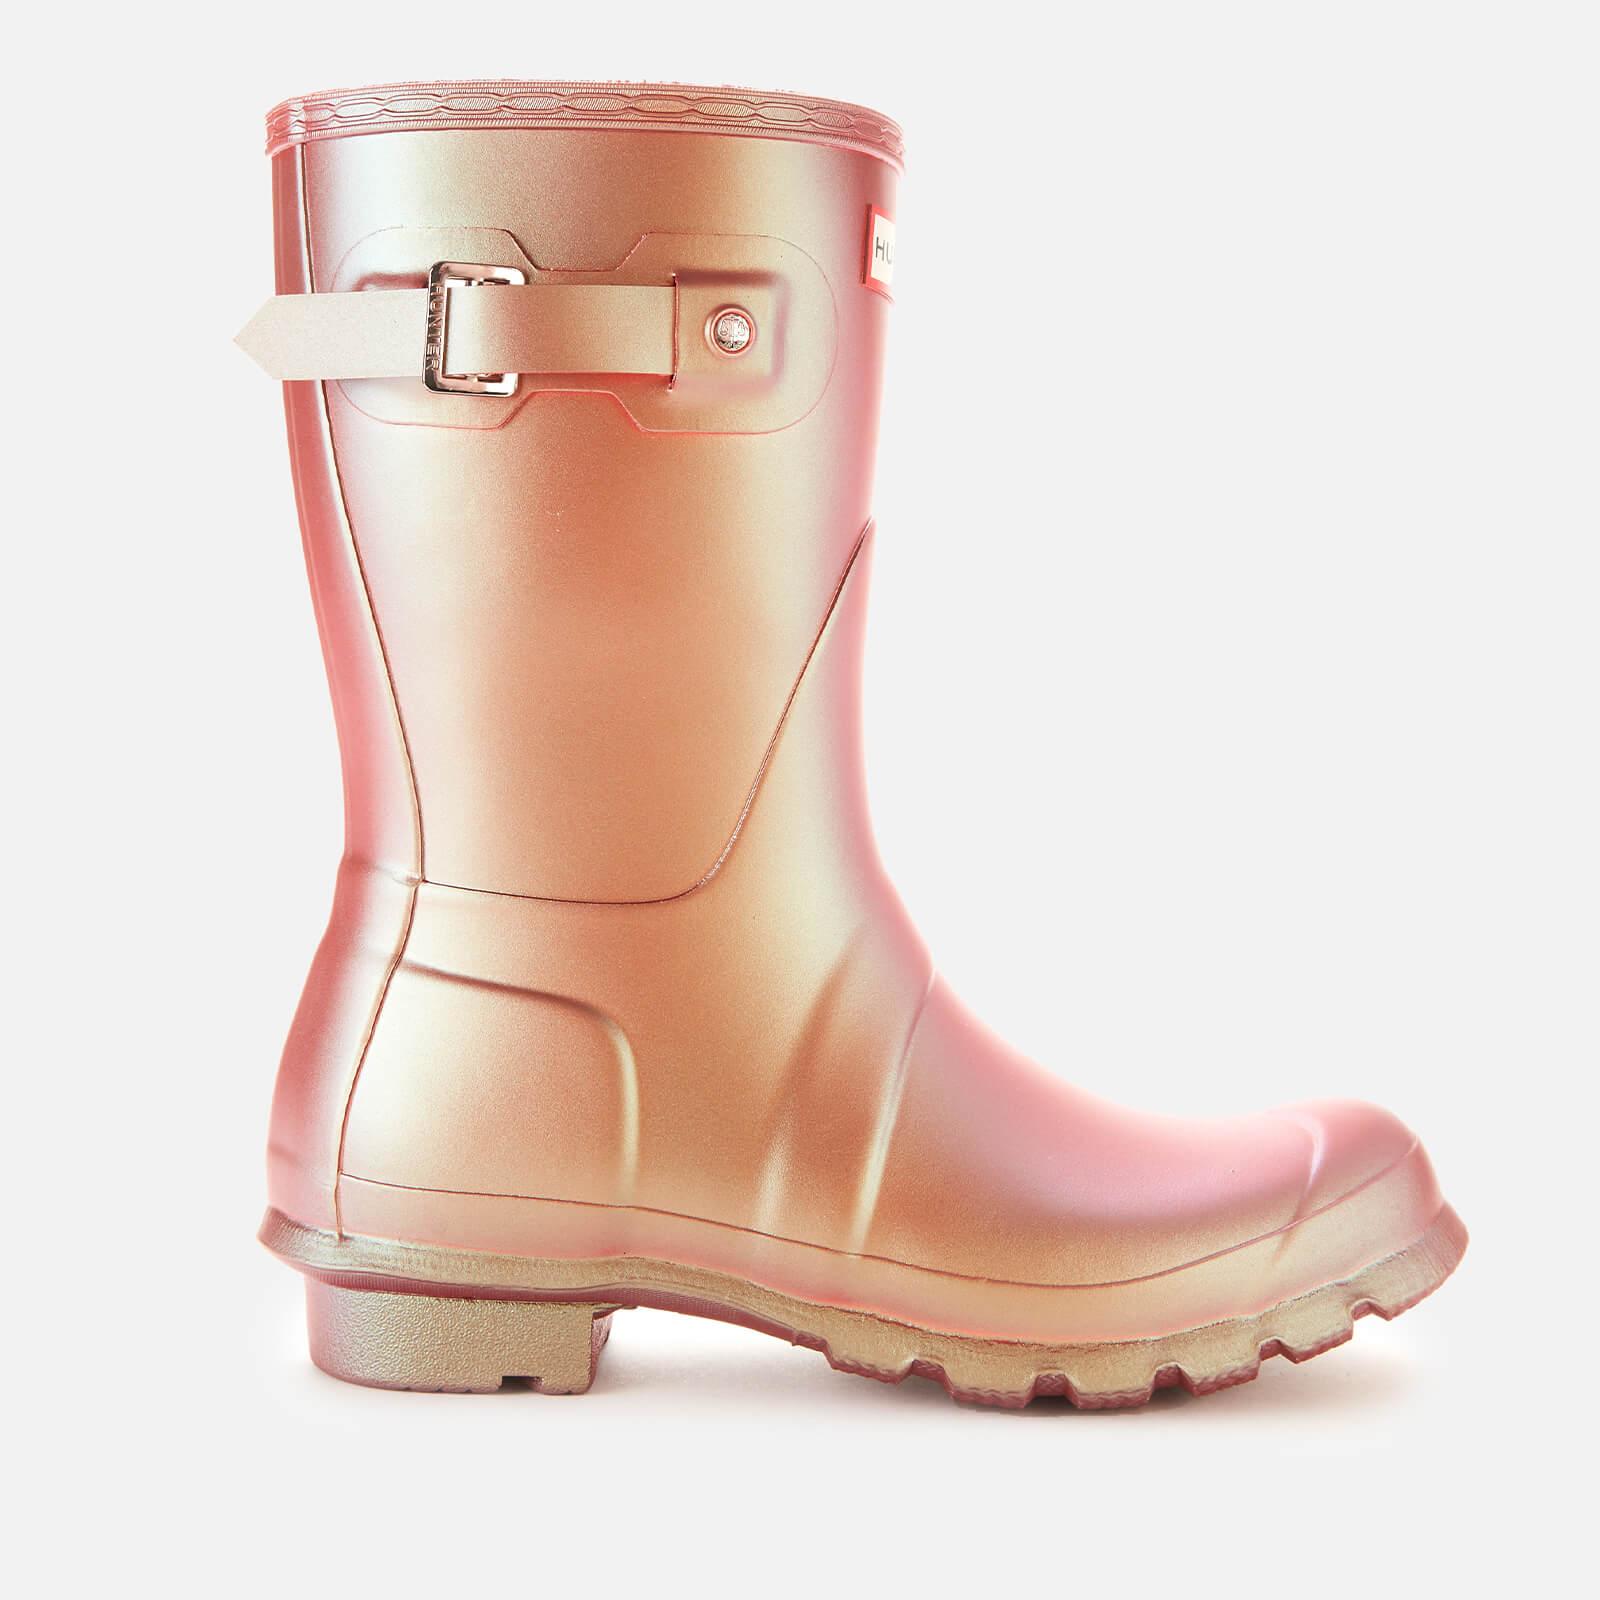 allSole 现有 Hunter 雨鞋 轻松享受折上折 让你爱上下雨天!